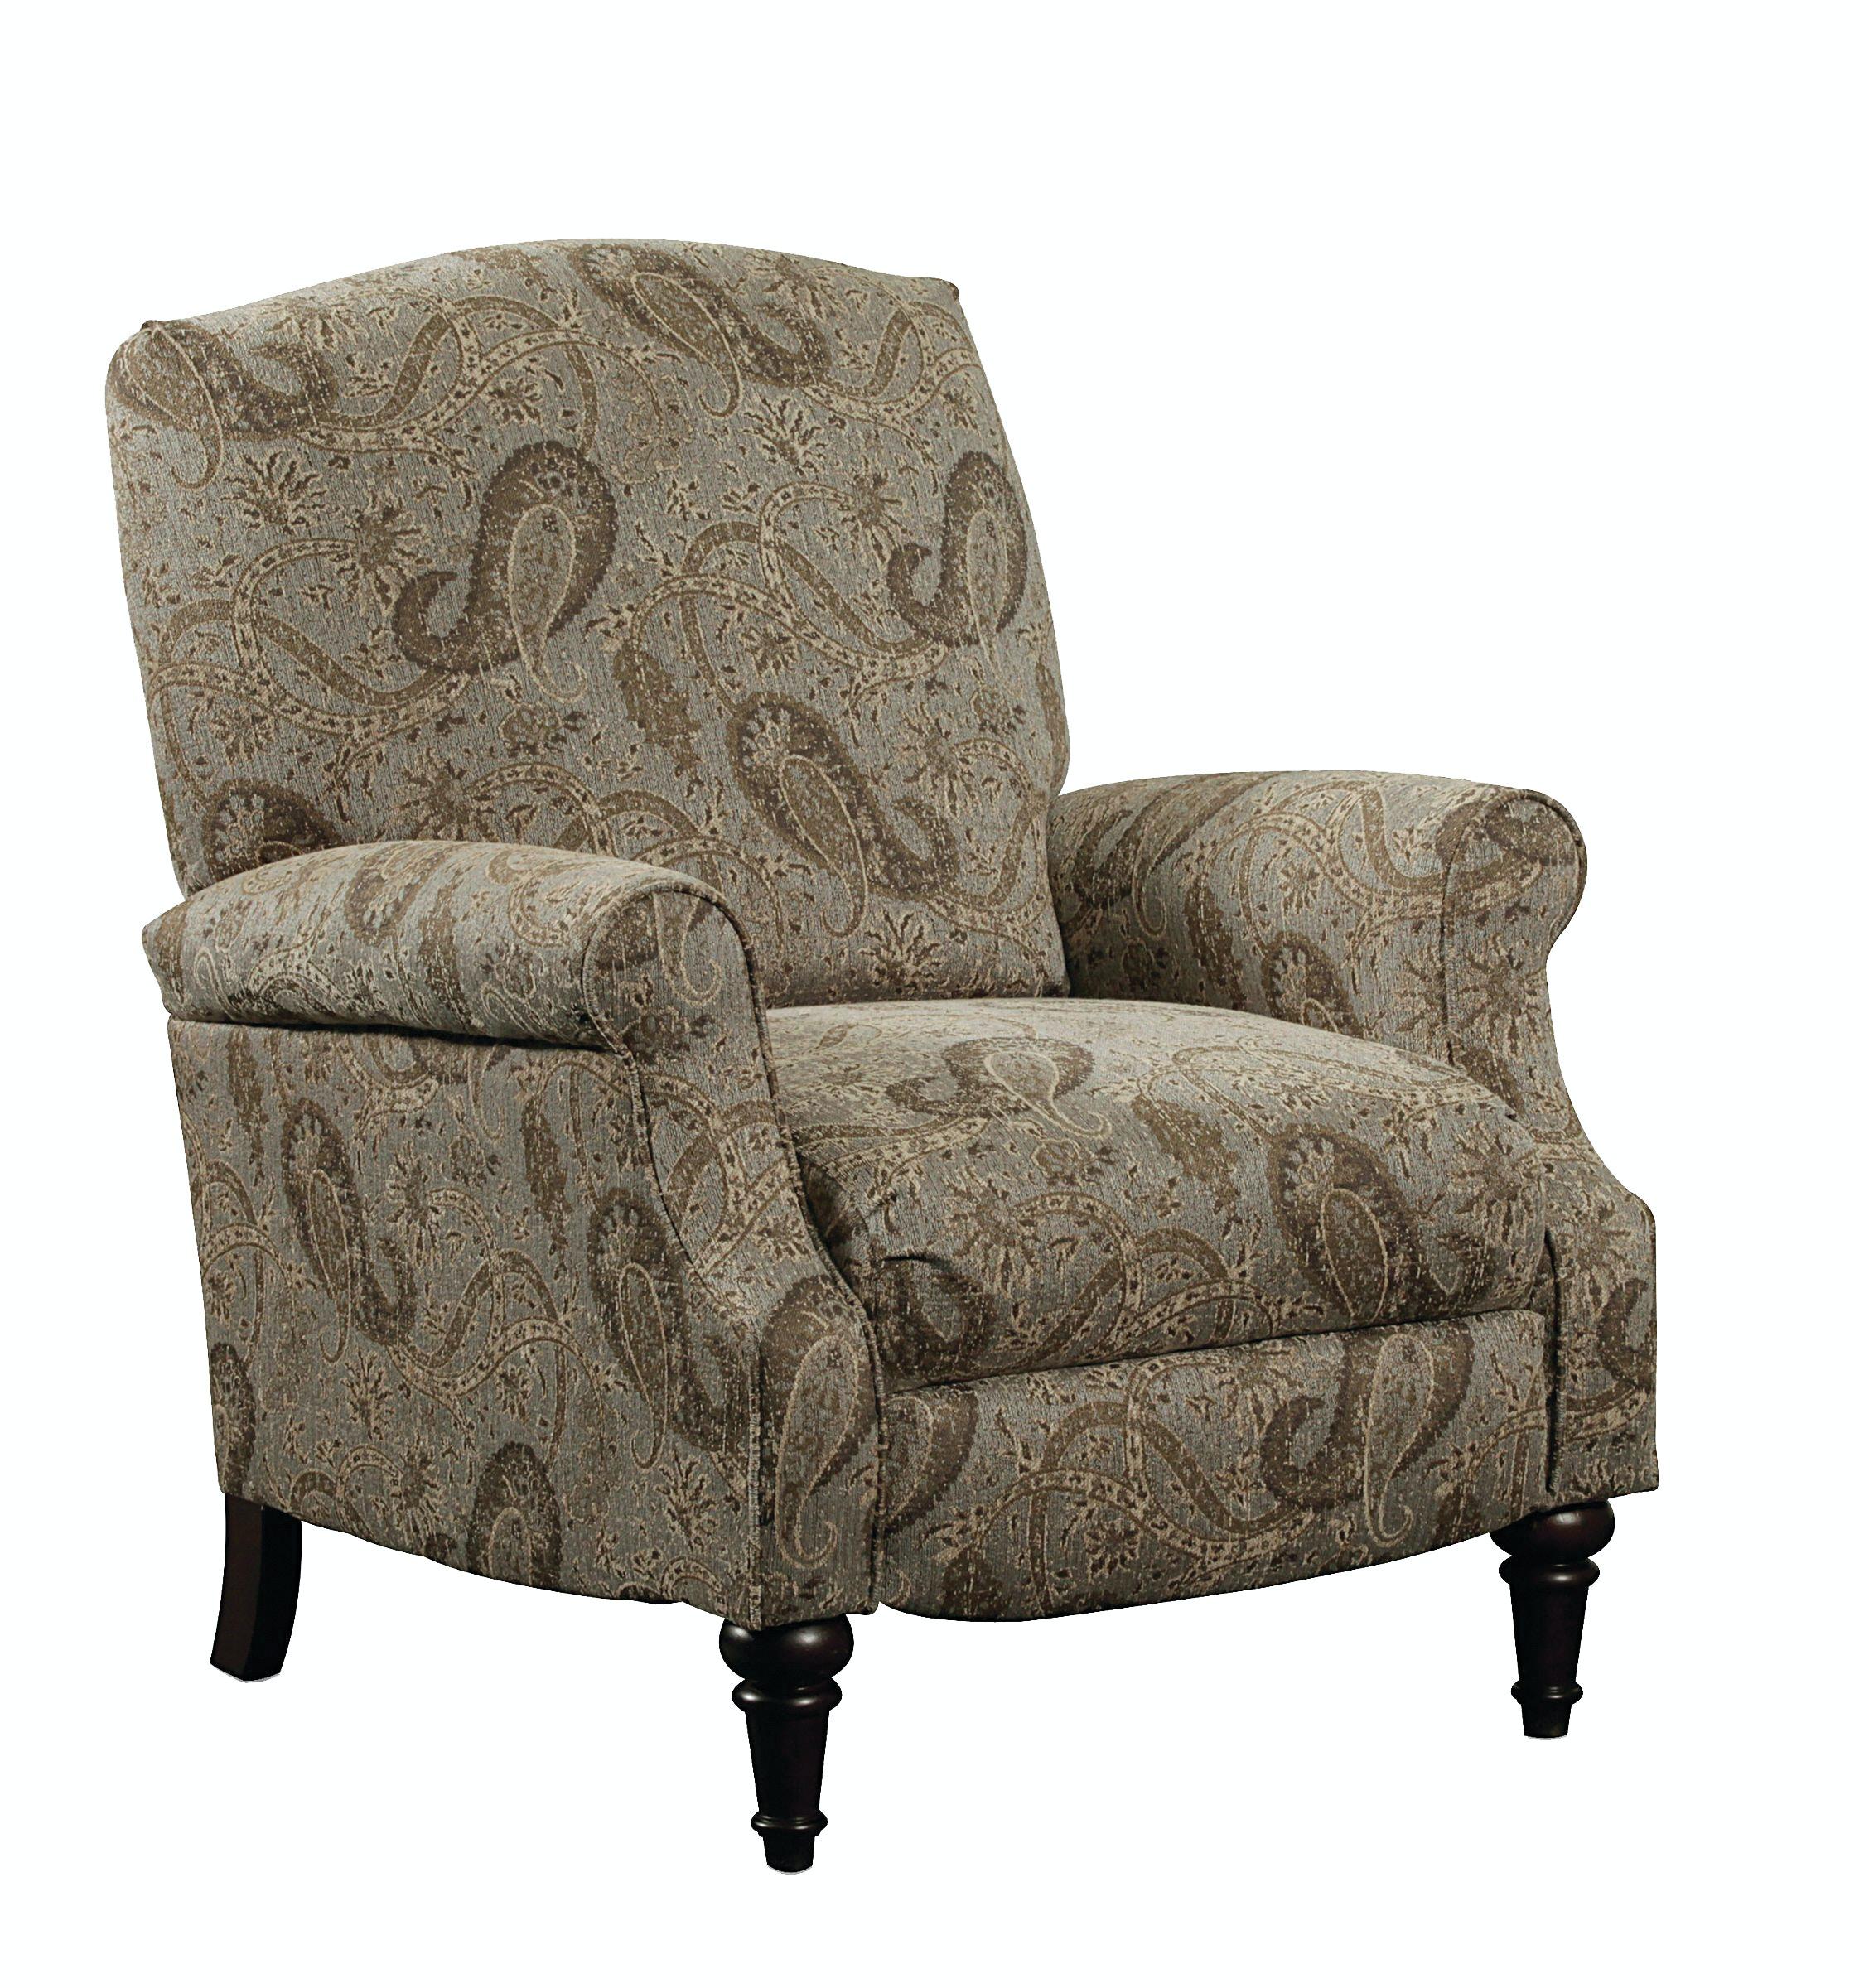 Lane Home Furnishings Chloe Hi-Leg Recliner 524398  sc 1 st  Kittleu0027s Furniture & Lane Home Furnishings Living Room Chloe Hi-Leg Recliner 524398 ... islam-shia.org